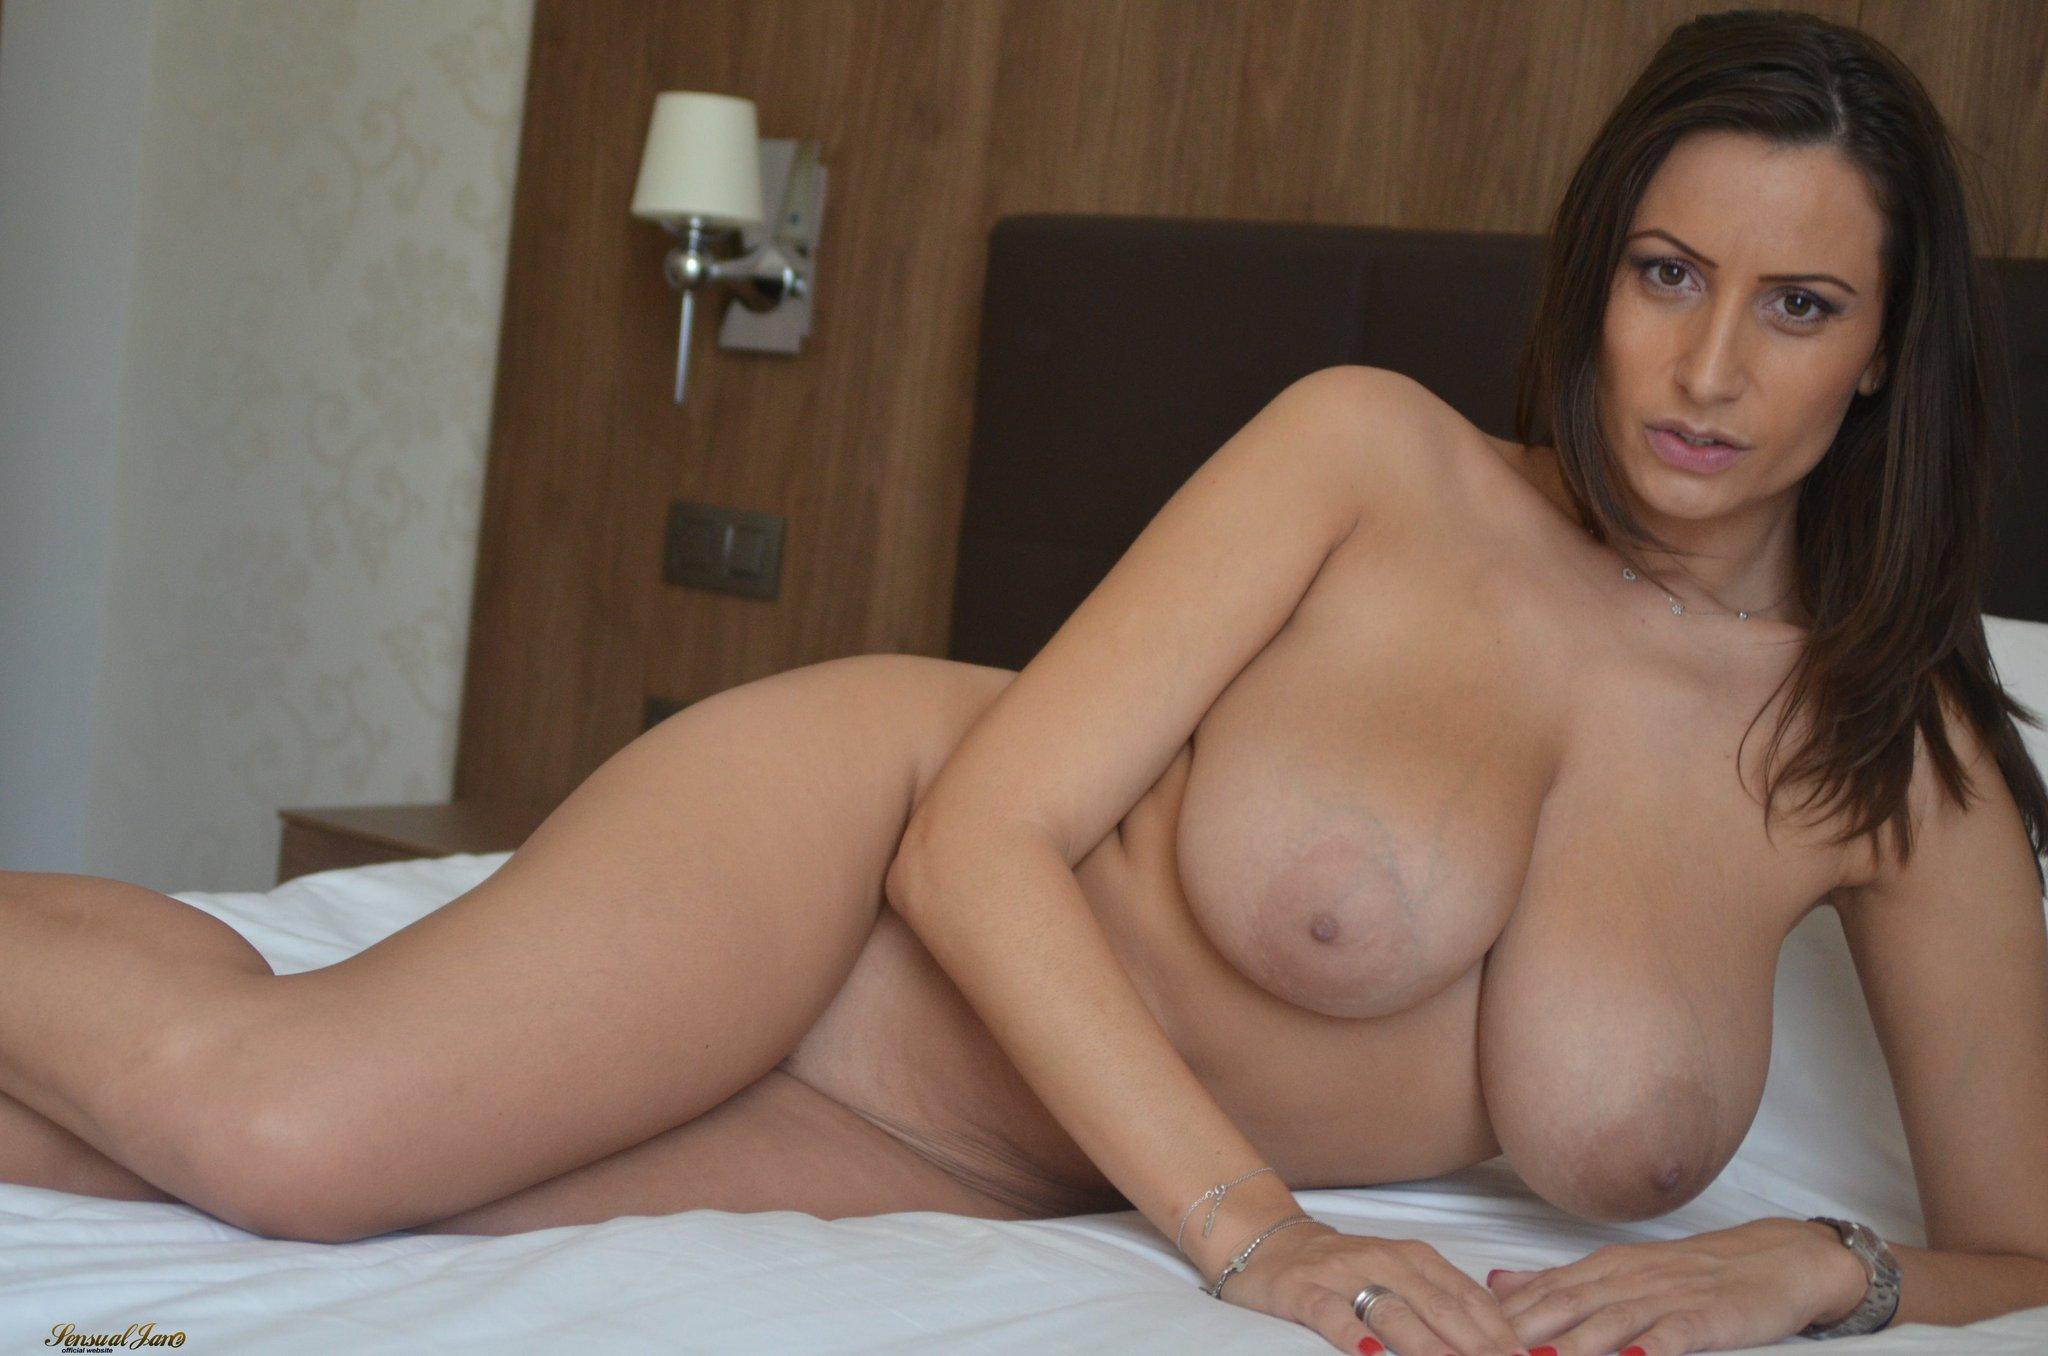 Ellen page nude in tallulah 2